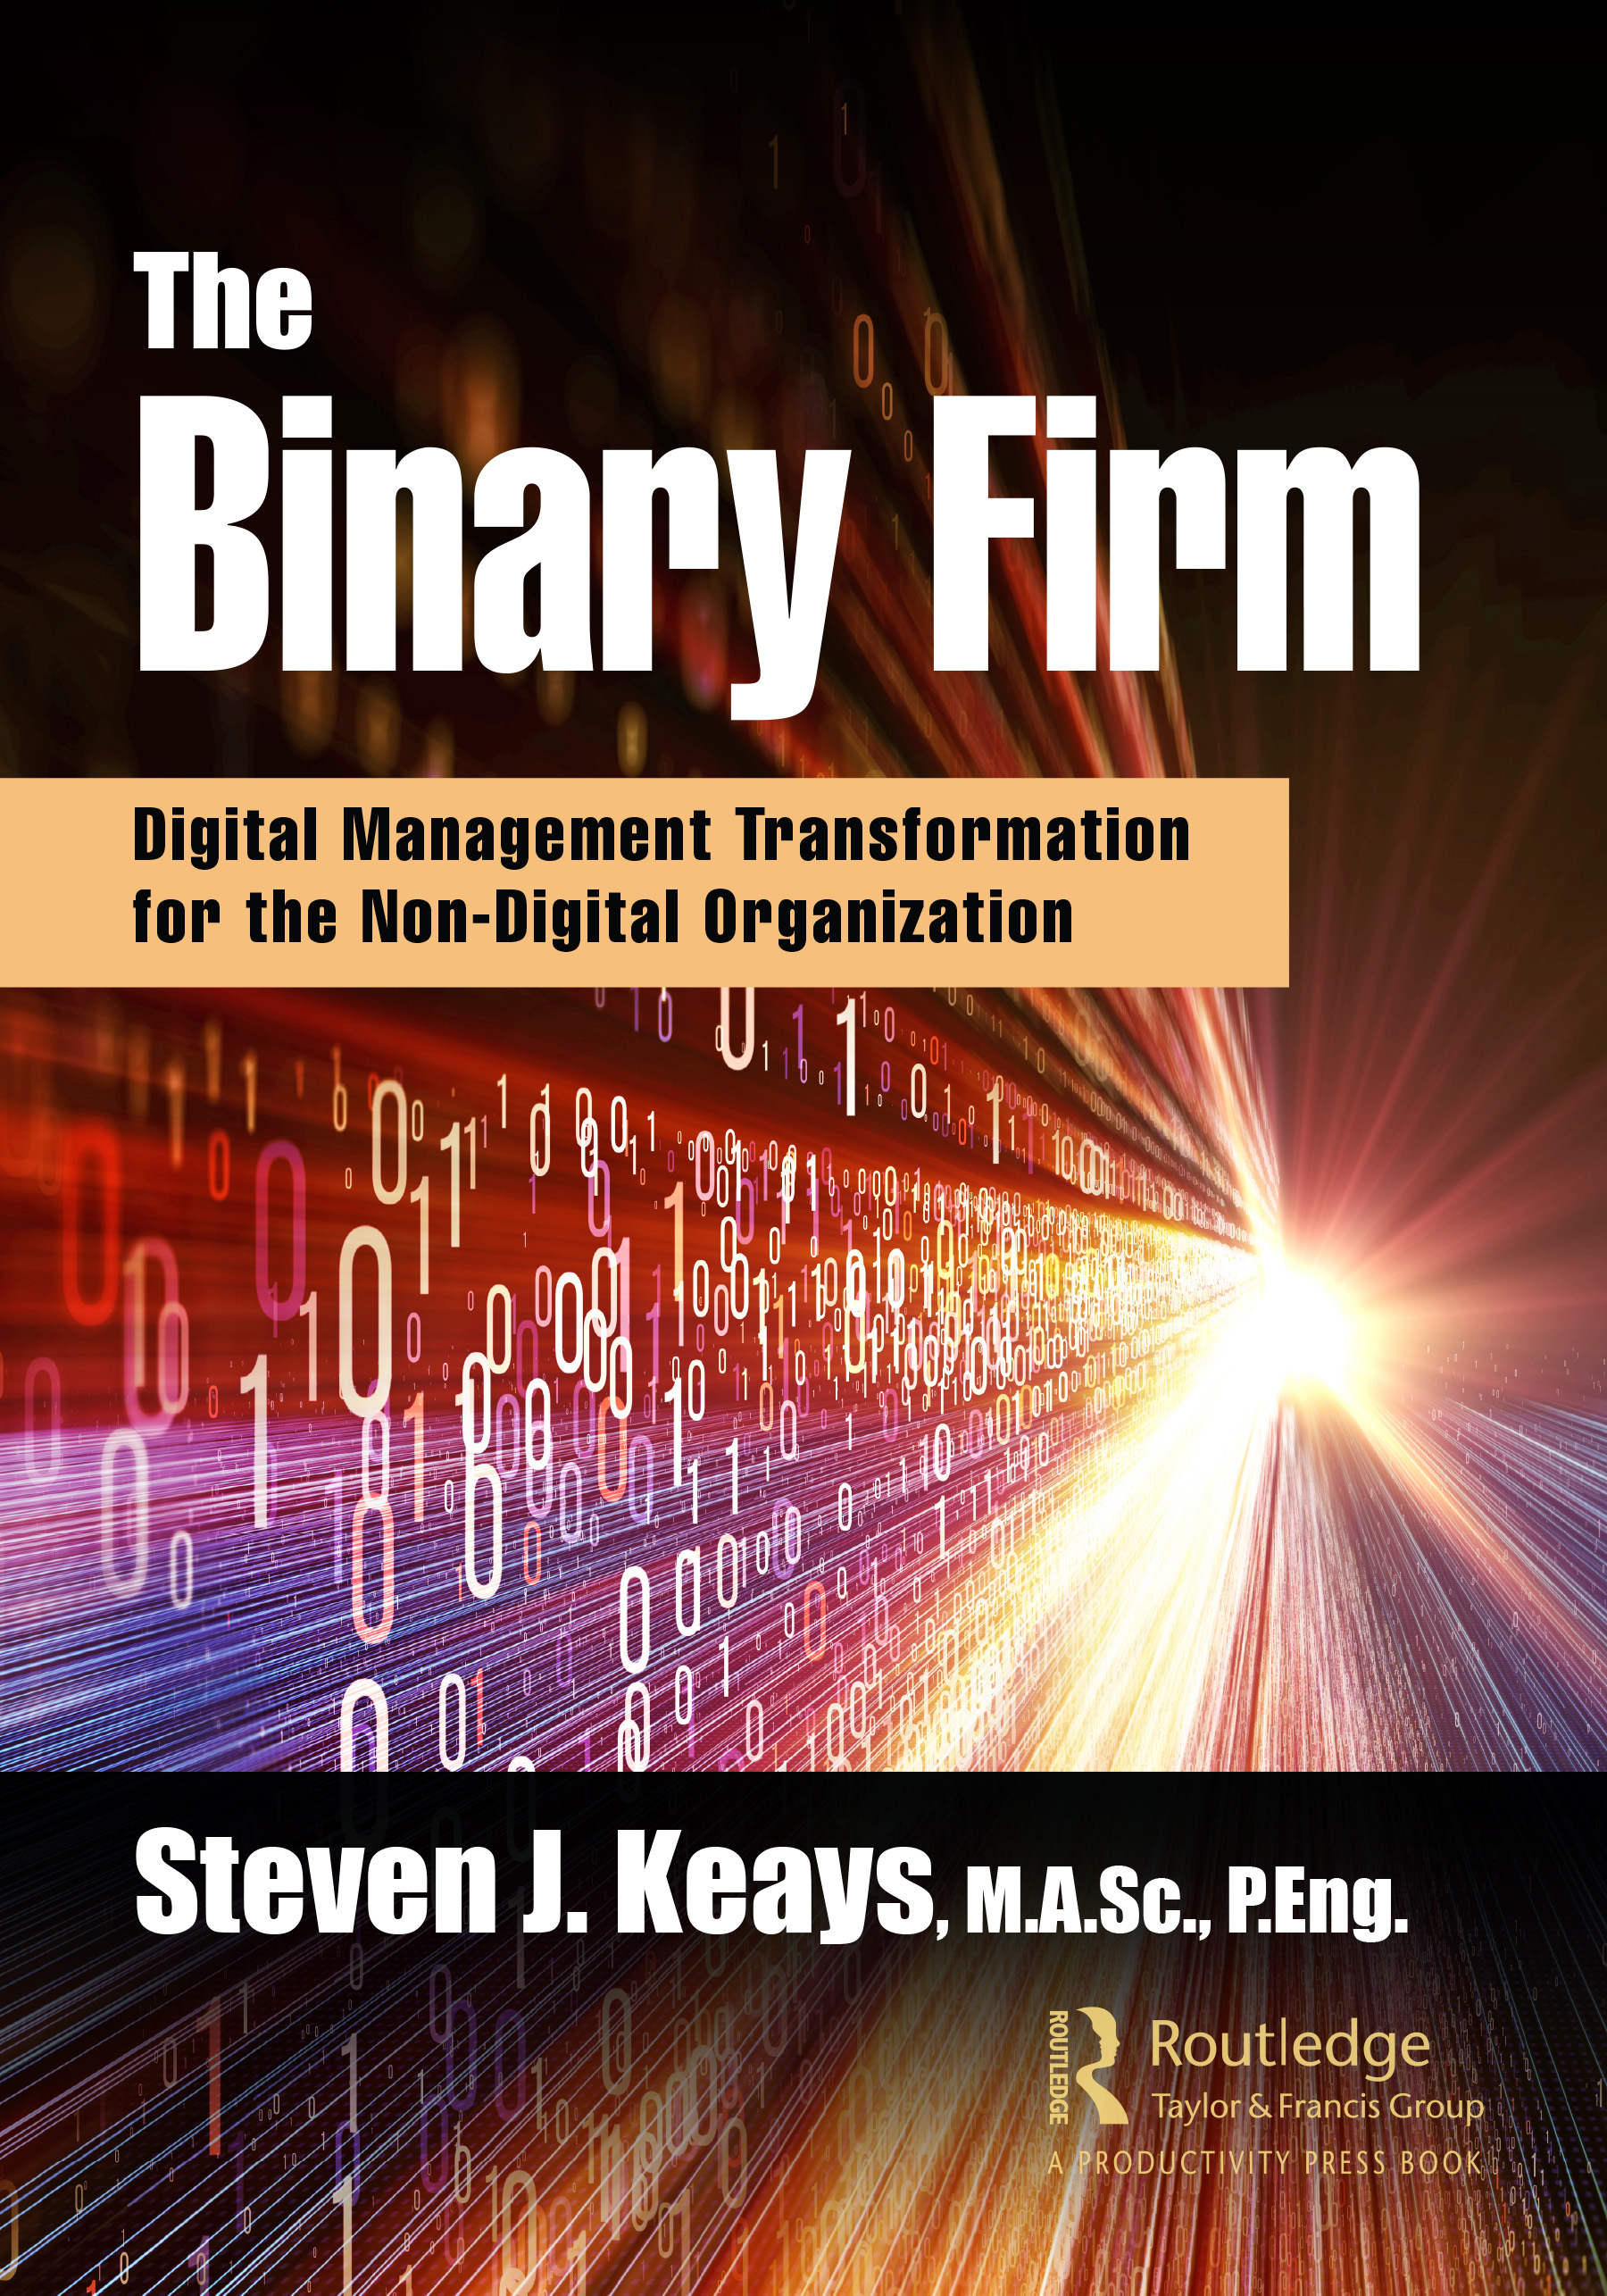 The Binary Firm